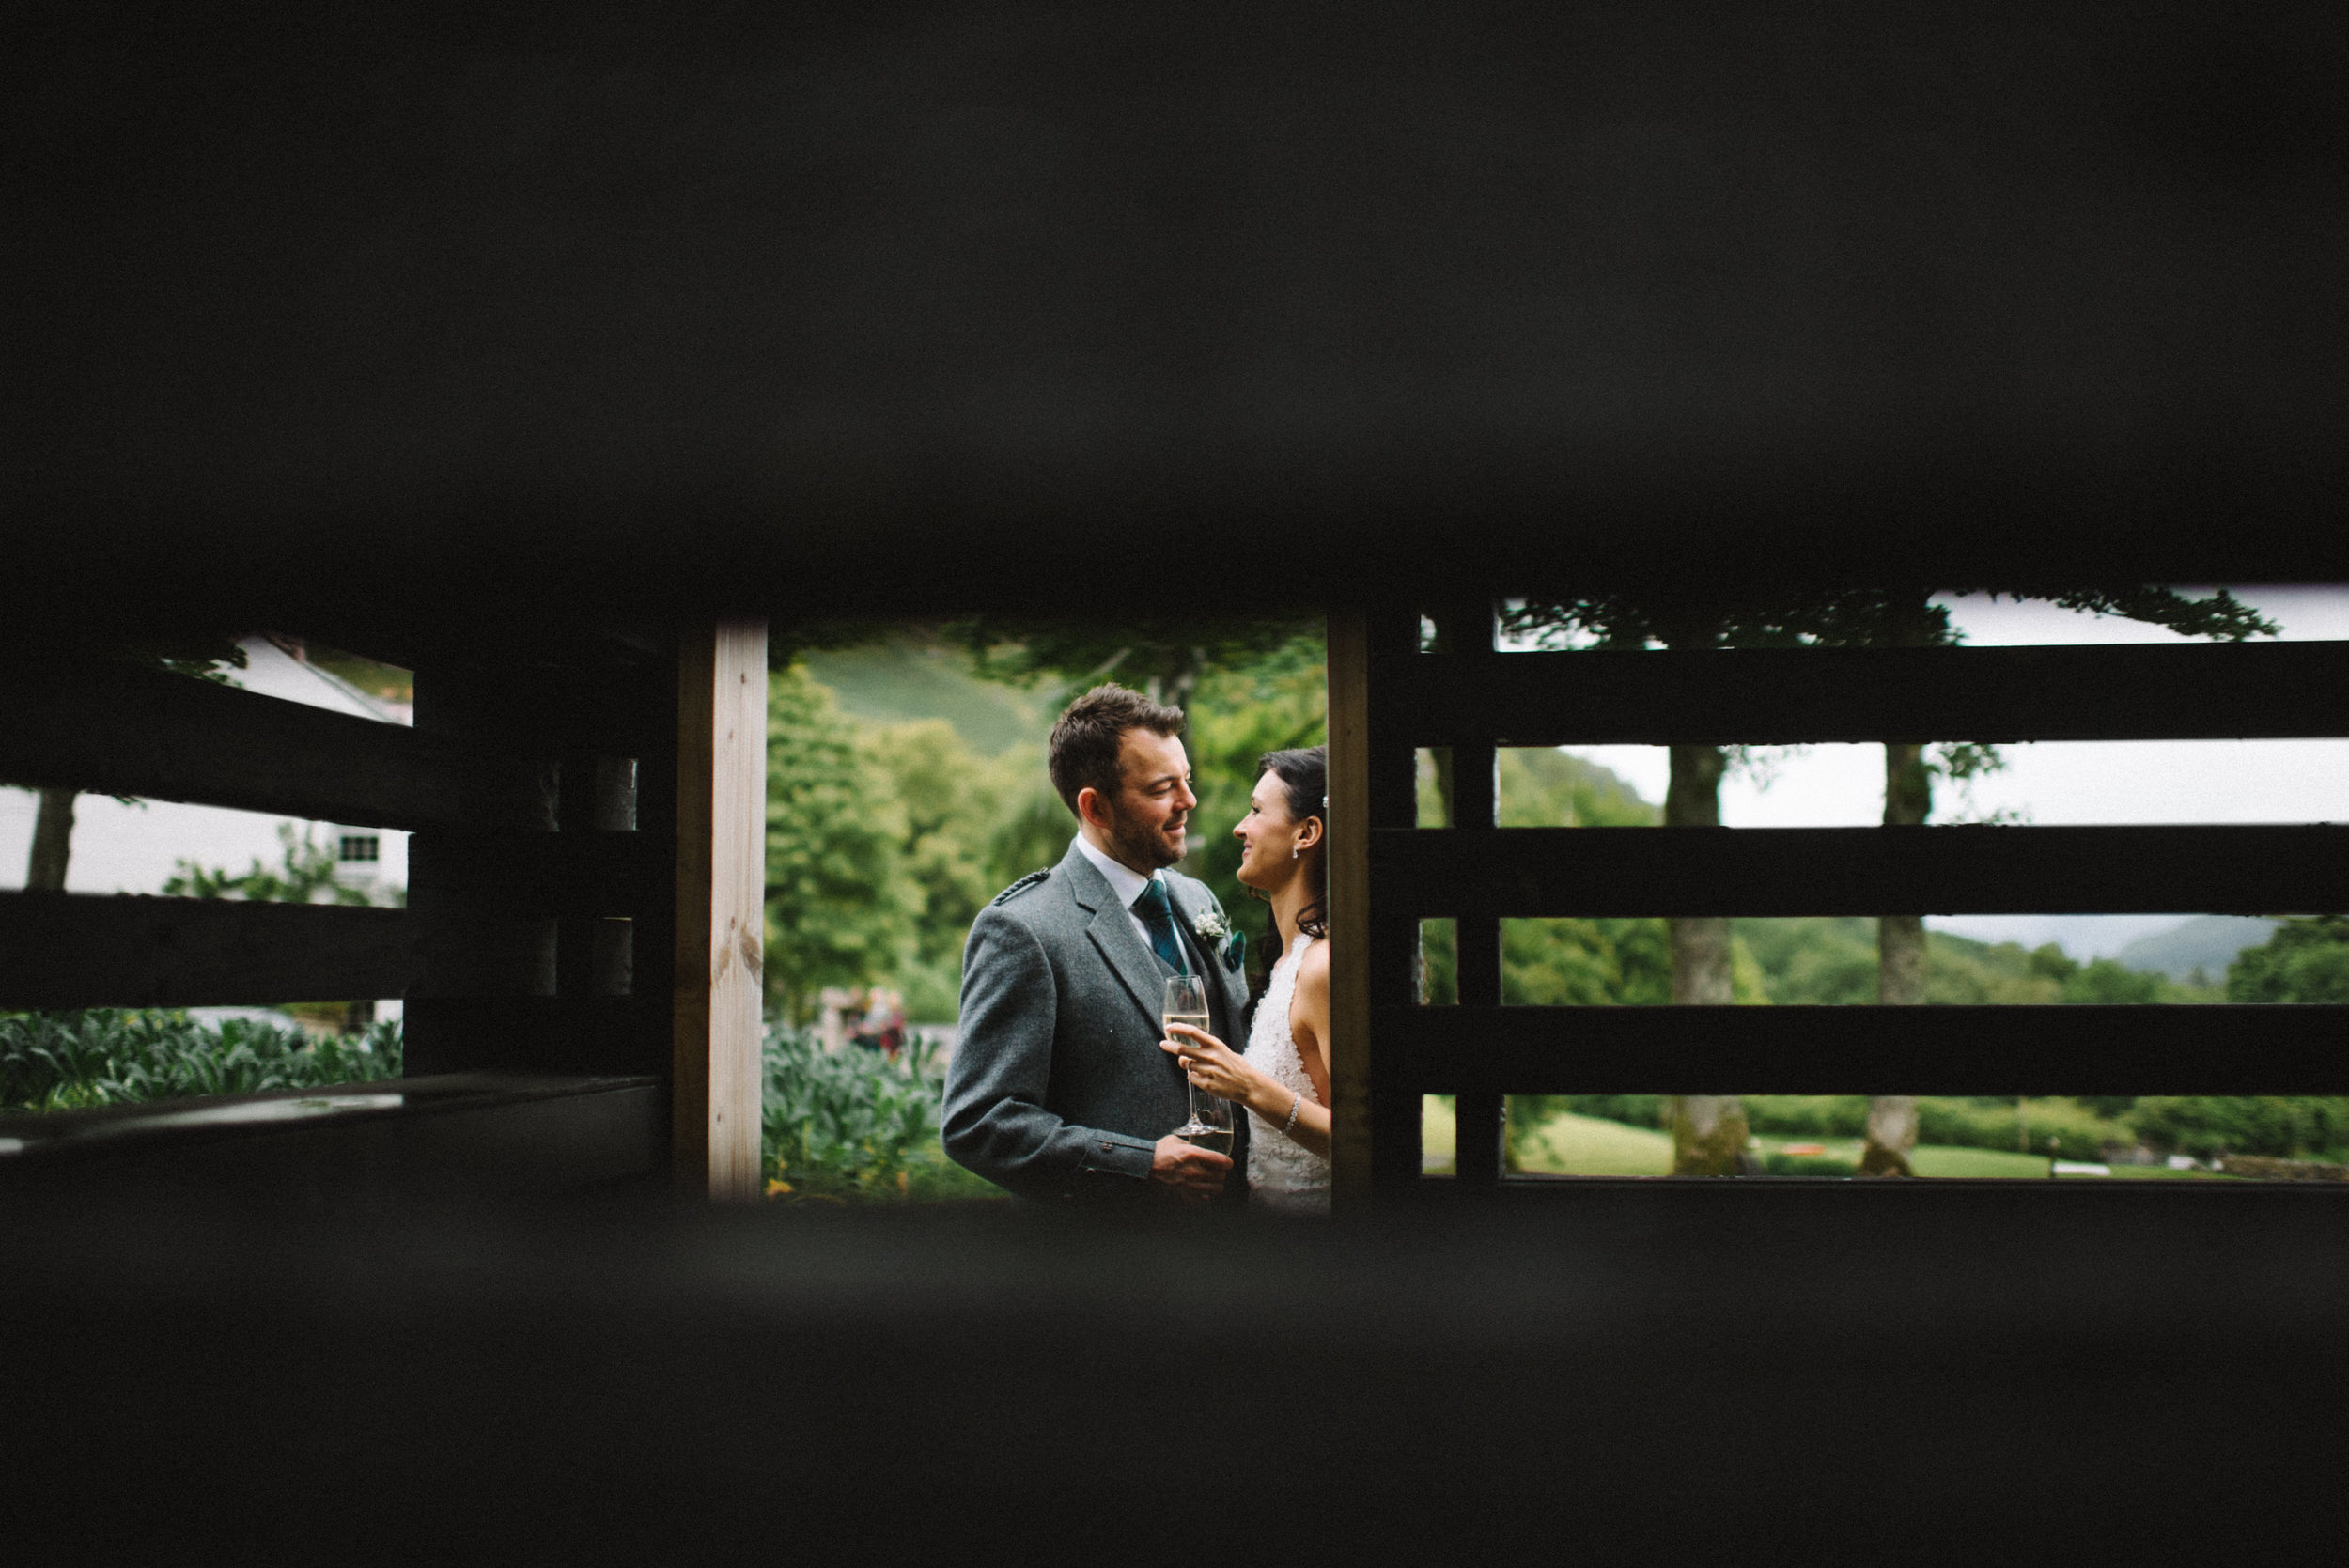 0053-LISA-DEVINE-PHOTOGRAPHY-ALTERNATIVE-WEDDING-PHOTOGRAPHY-SCOTLAND-DESTINATION-WEDDINGS-GLASGOW-WEDDINGS-COOL-WEDDINGS-STYLISH-WEDDINGS.JPG